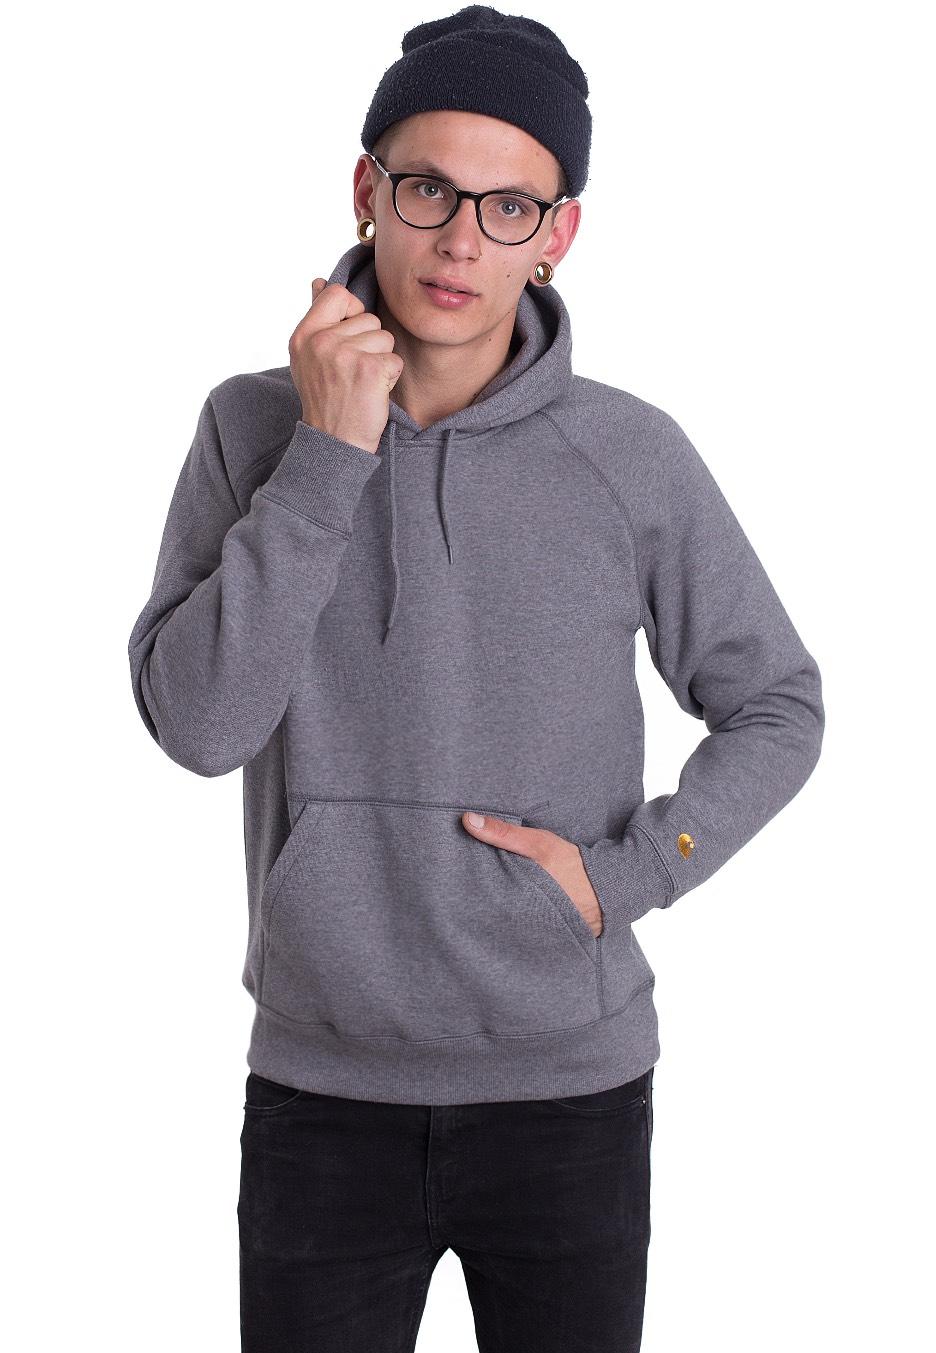 aaf381ecab8 Carhartt WIP - Hooded Chase Dark Grey Heather/Gold - Hoodie - Streetwear  Shop - Impericon.com UK